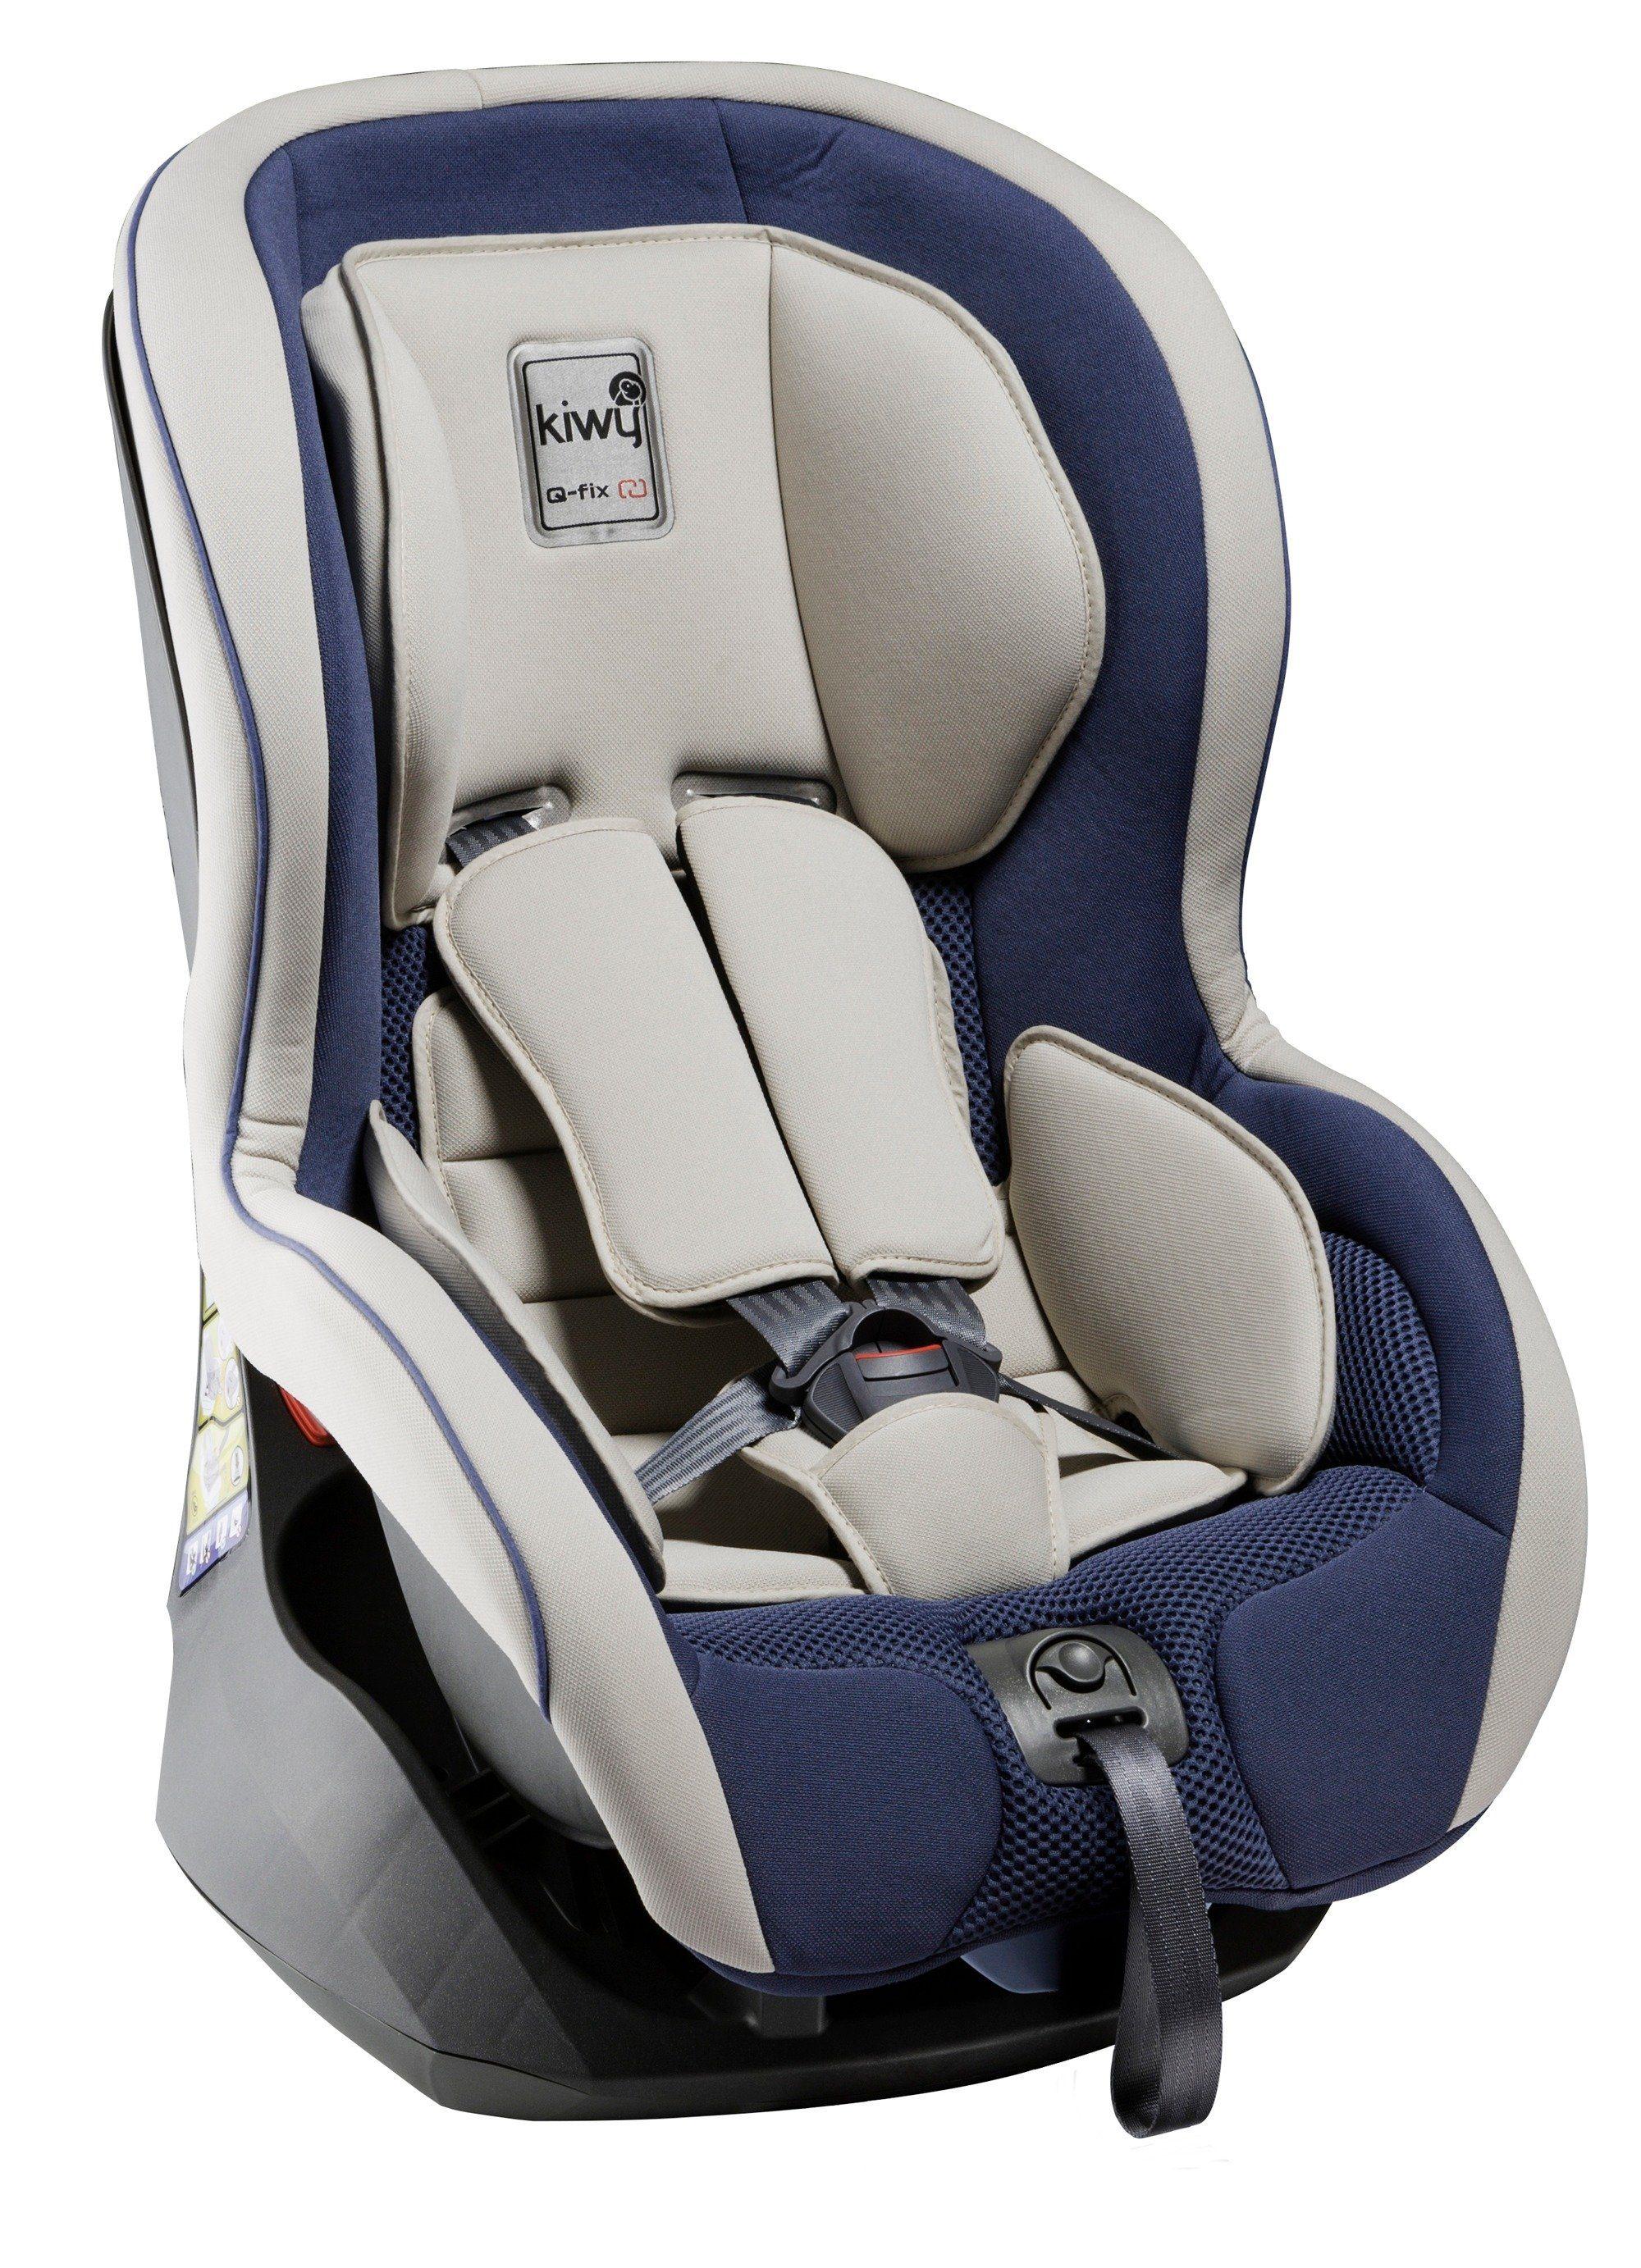 KIWY Kindersitz »SP1«, 9 - 18 kg